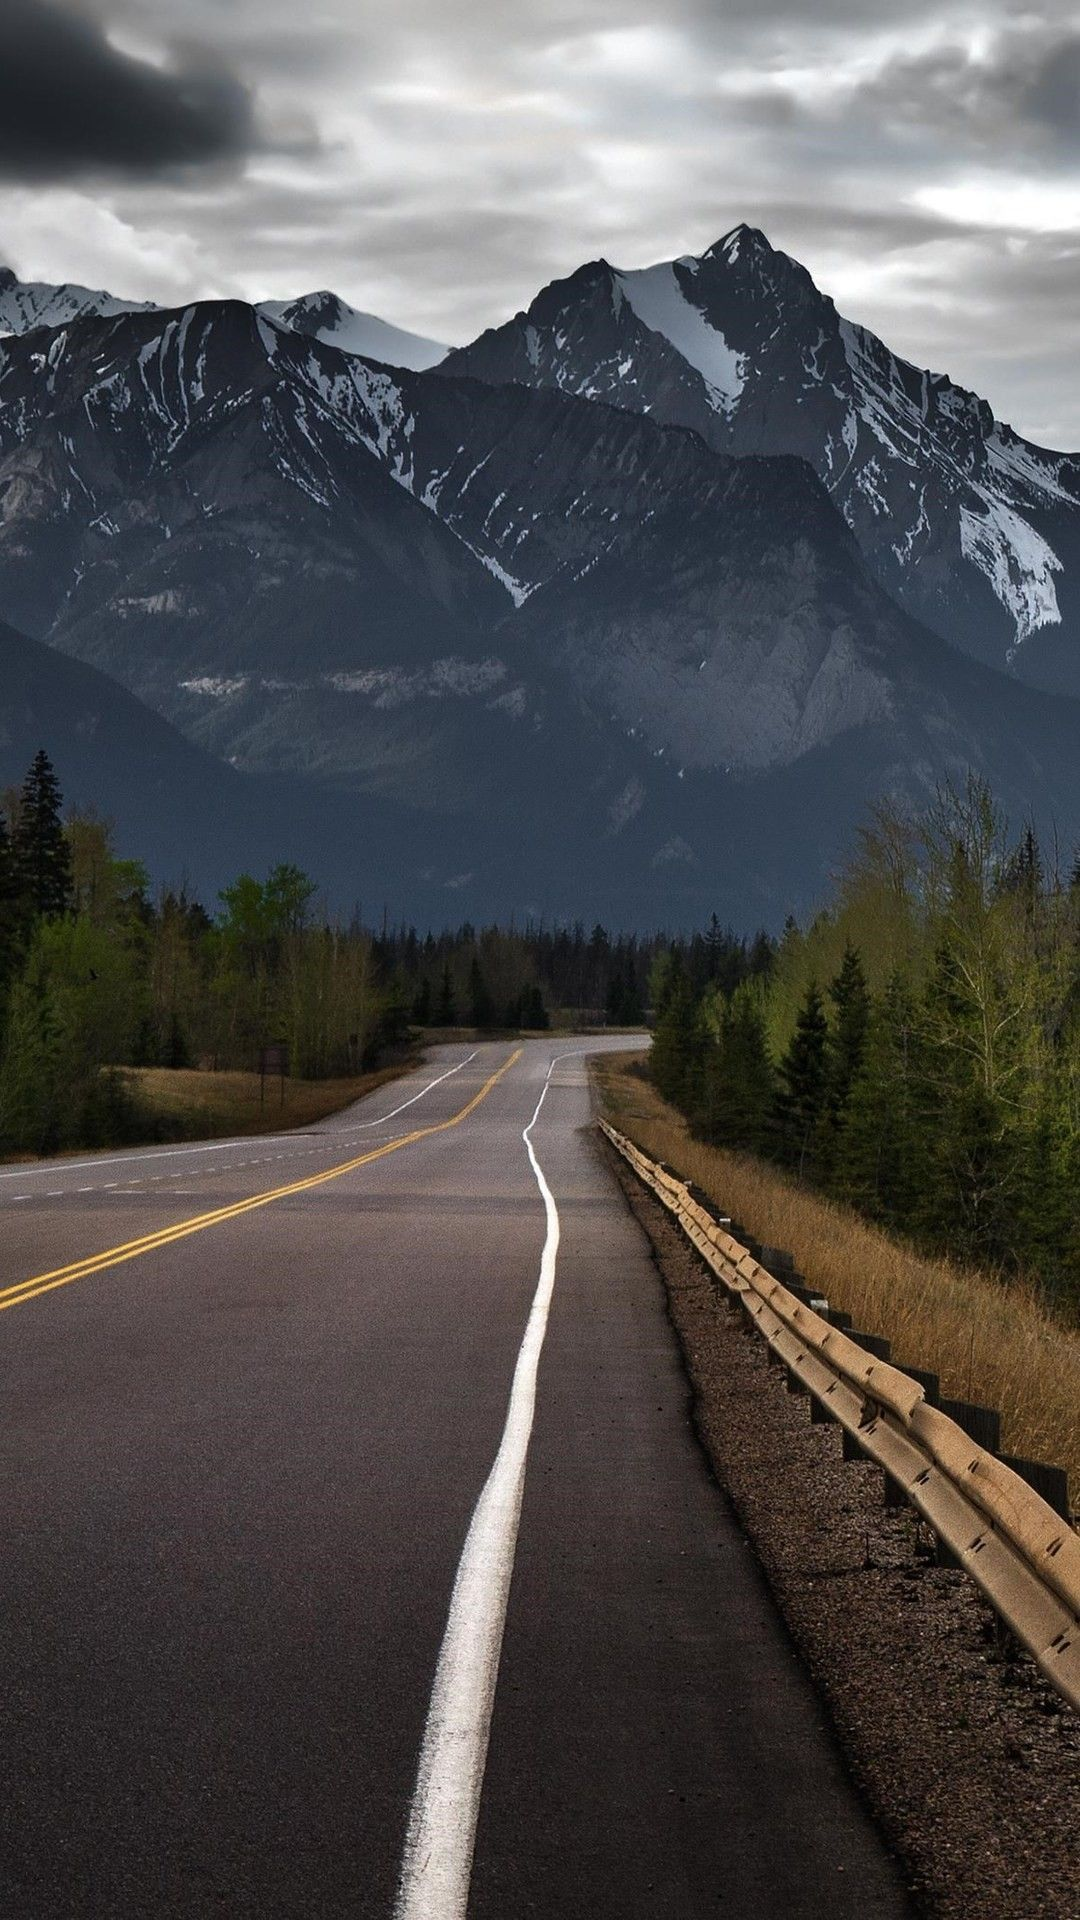 Road To Mountains Hd Wallpaper 1080x1920 Scenery Wallpaper